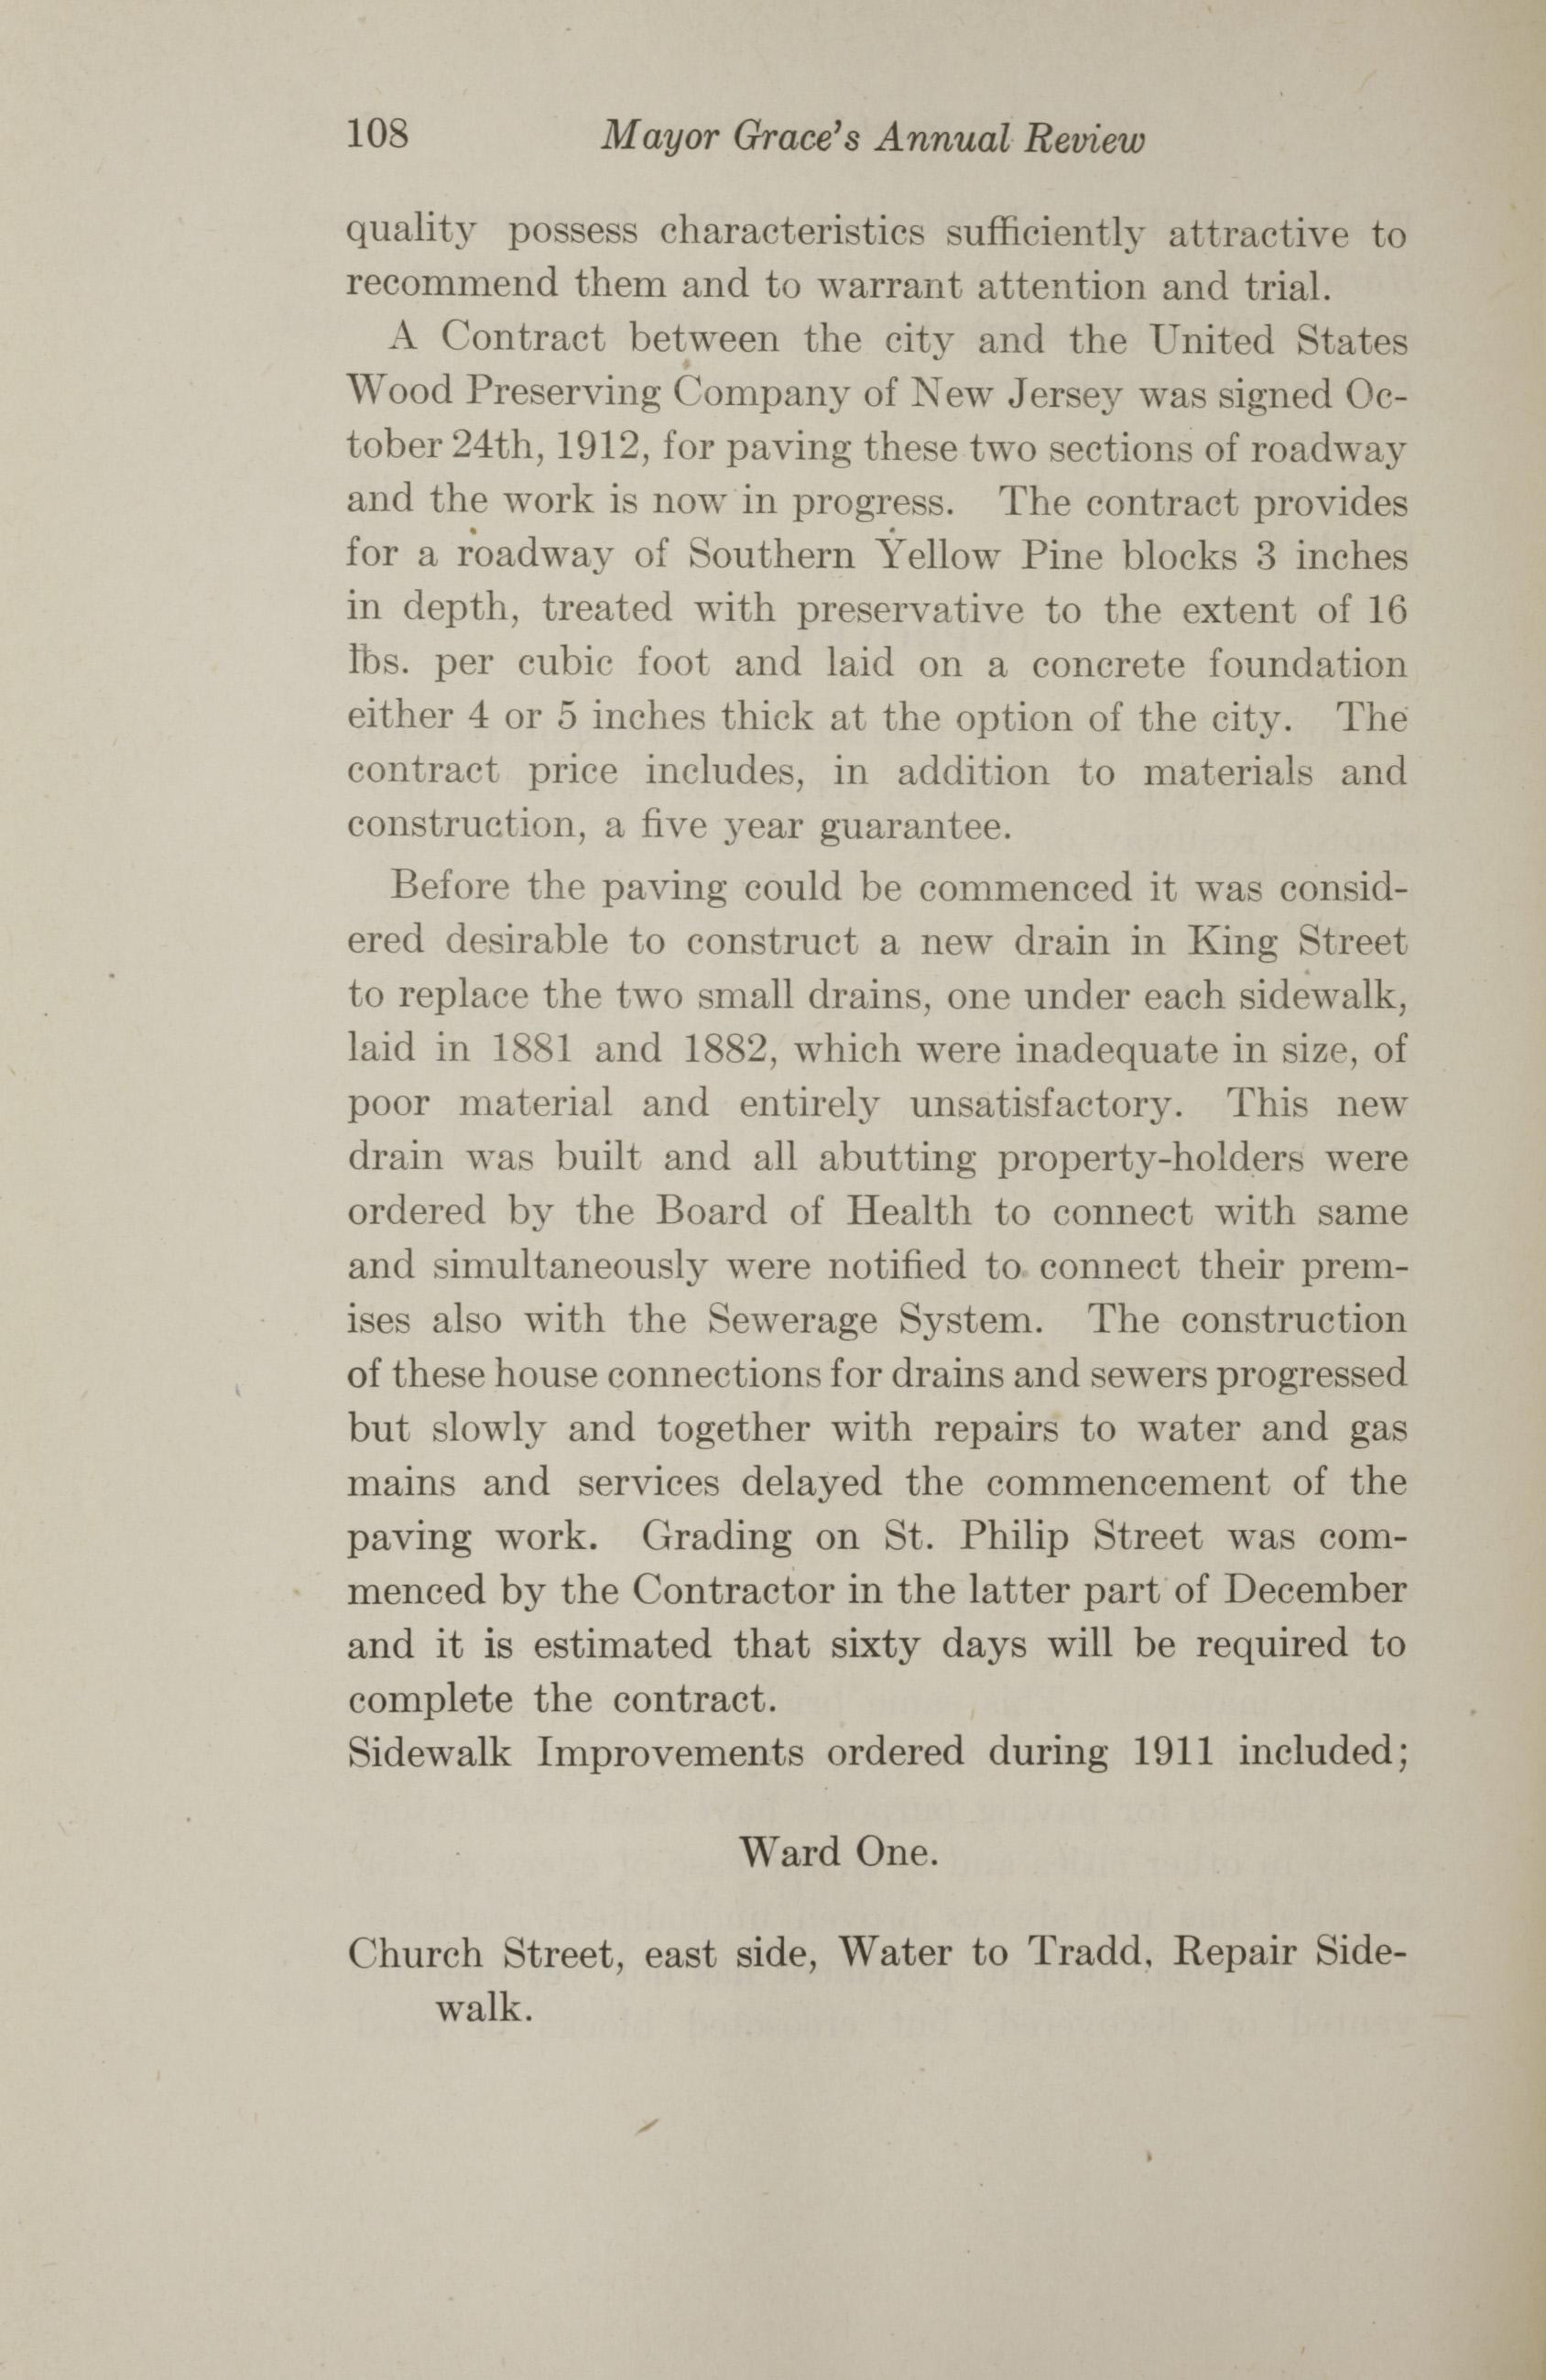 Charleston Yearbook, 1912, page 108